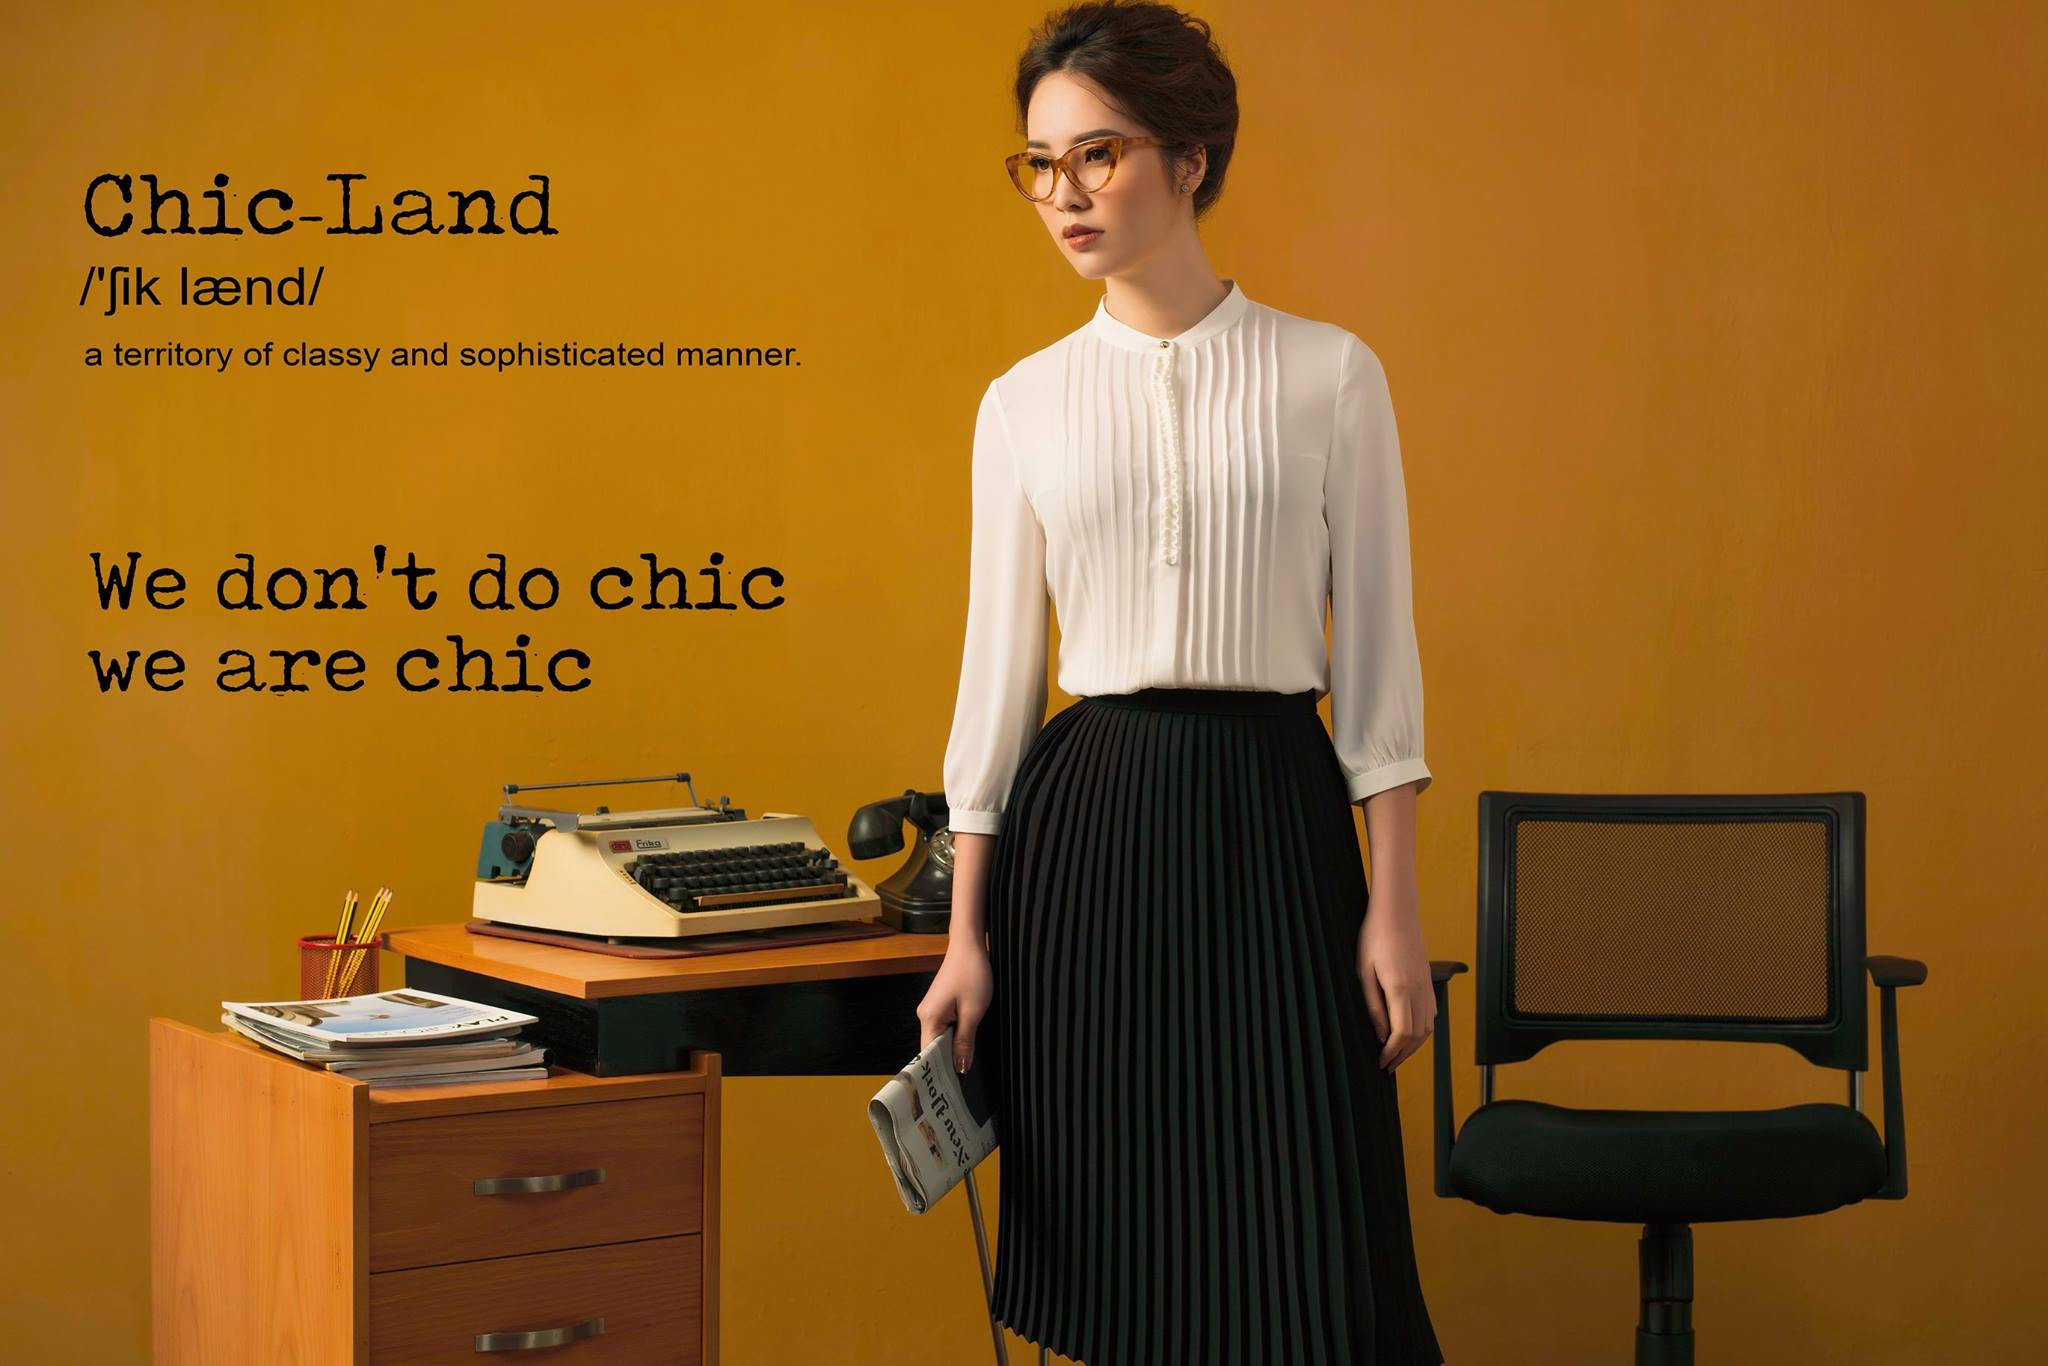 elegant girl - CHICLAND hotel